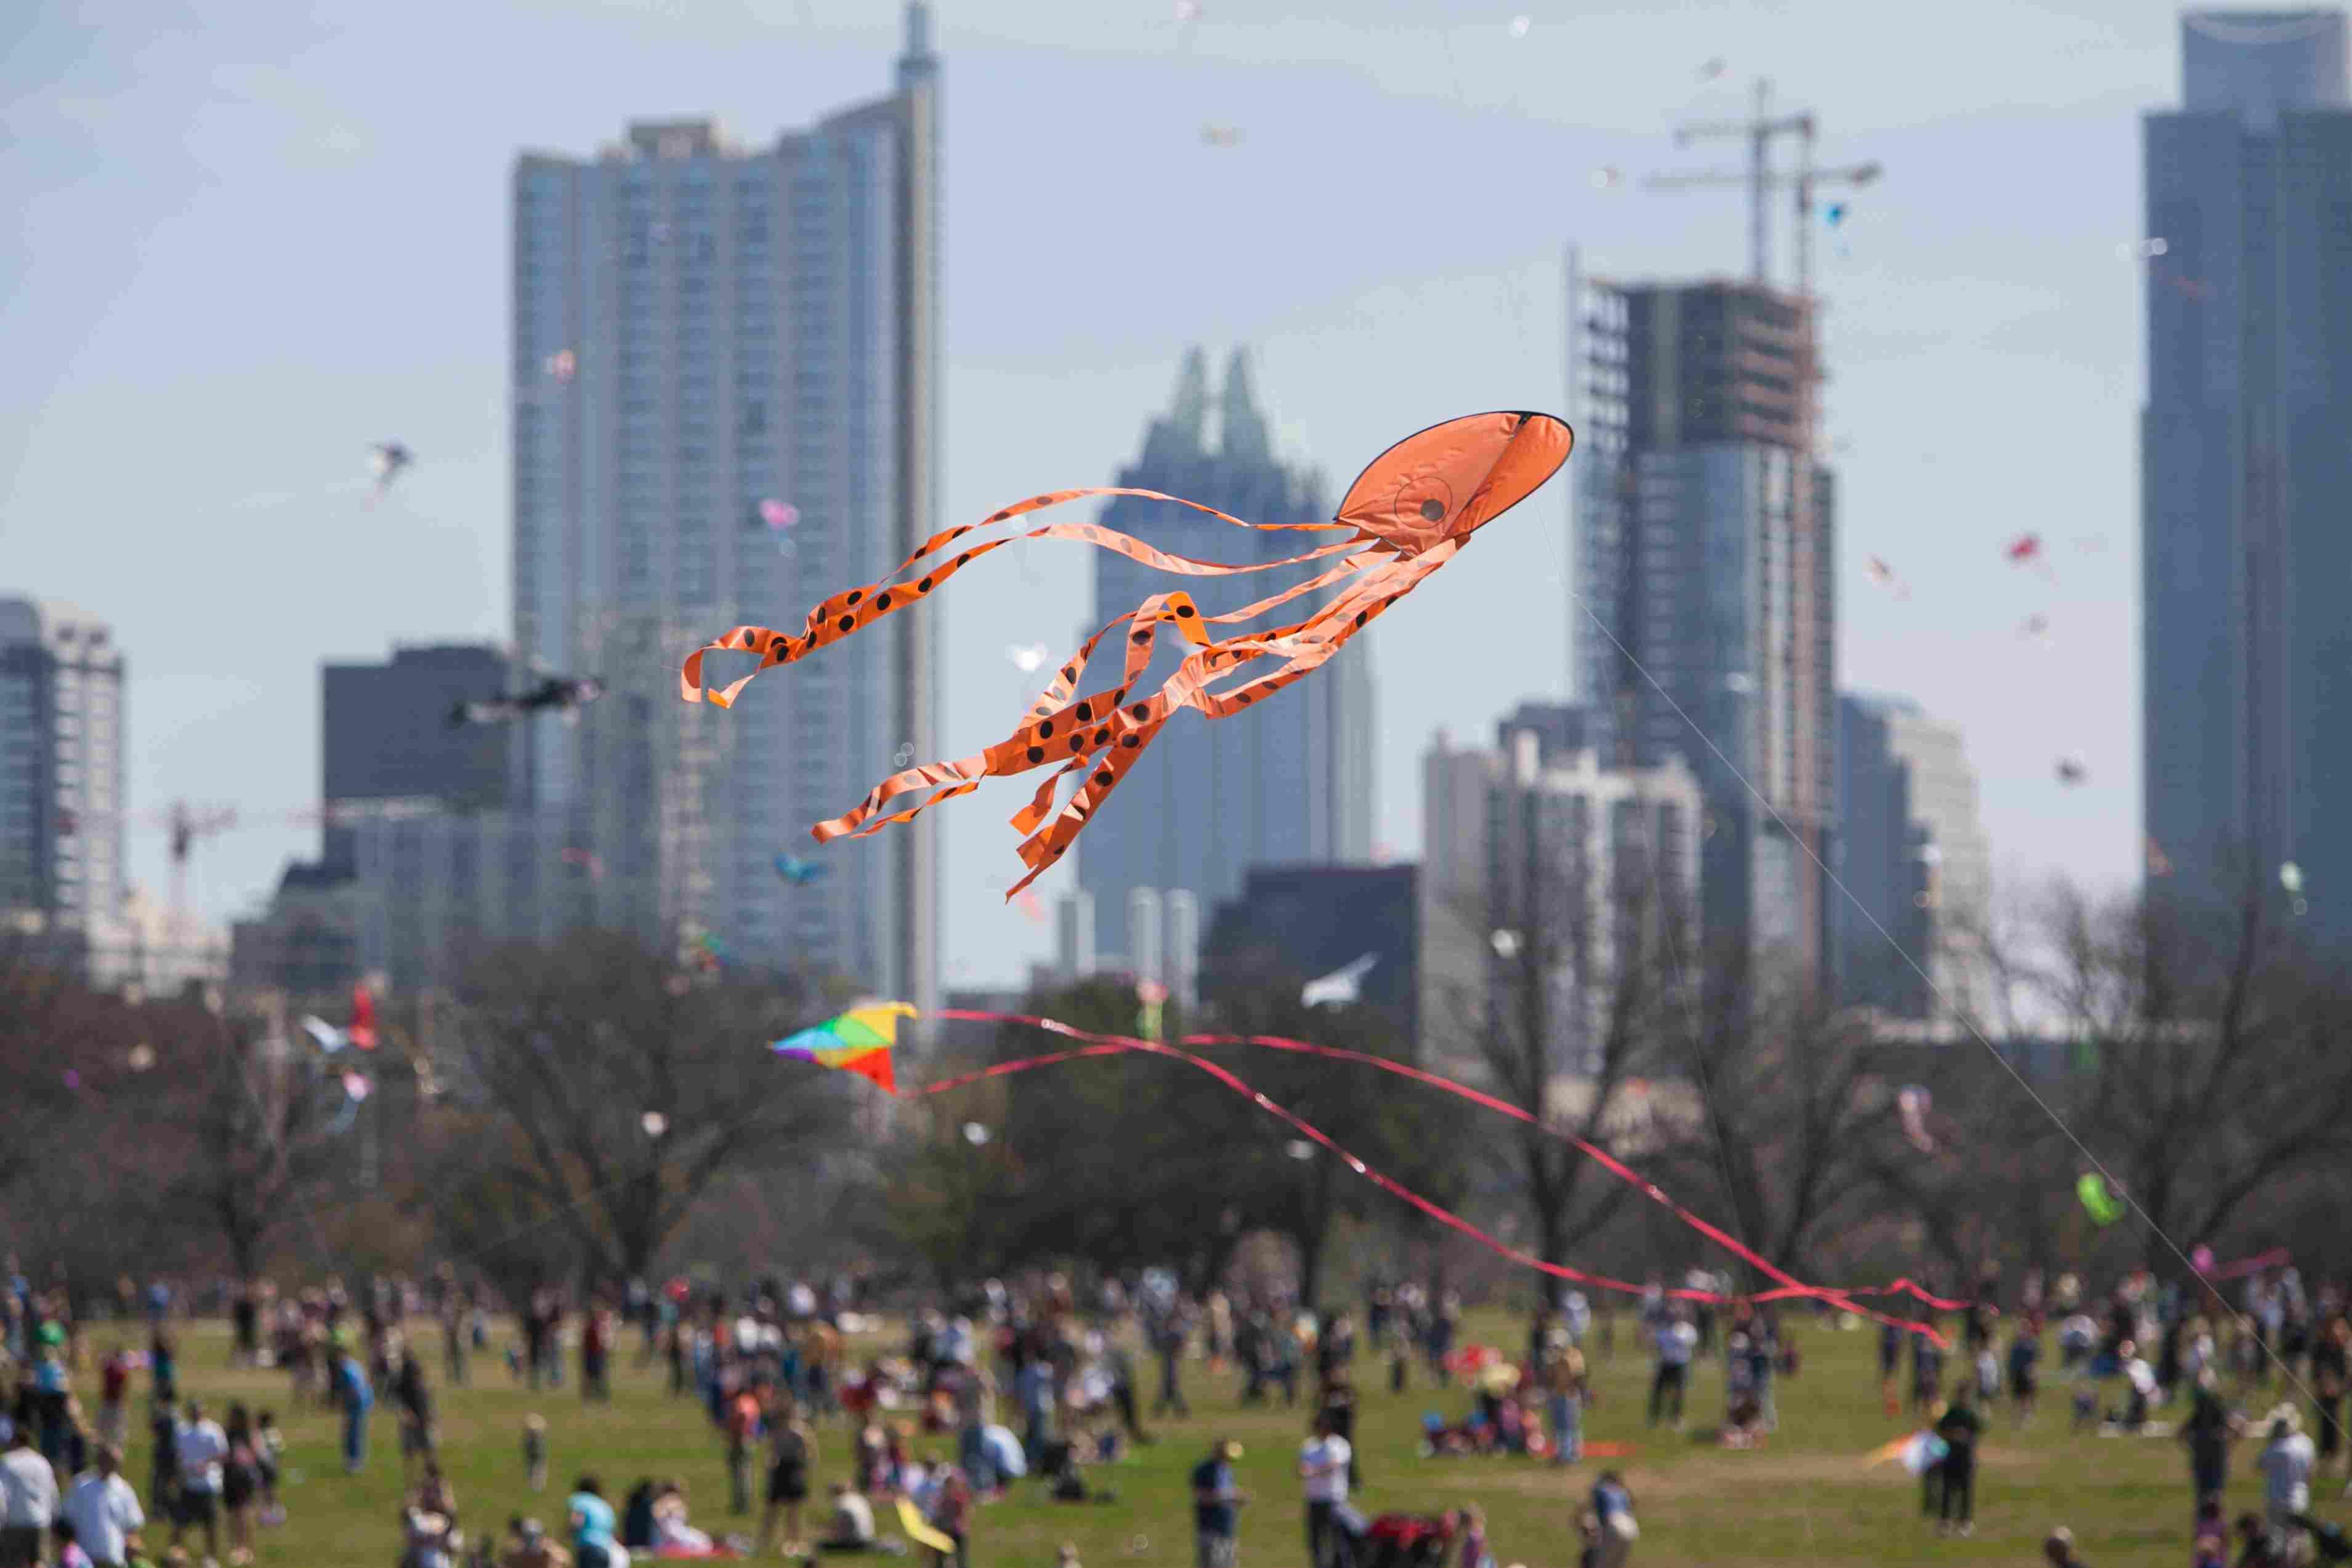 Austin Kite Festival